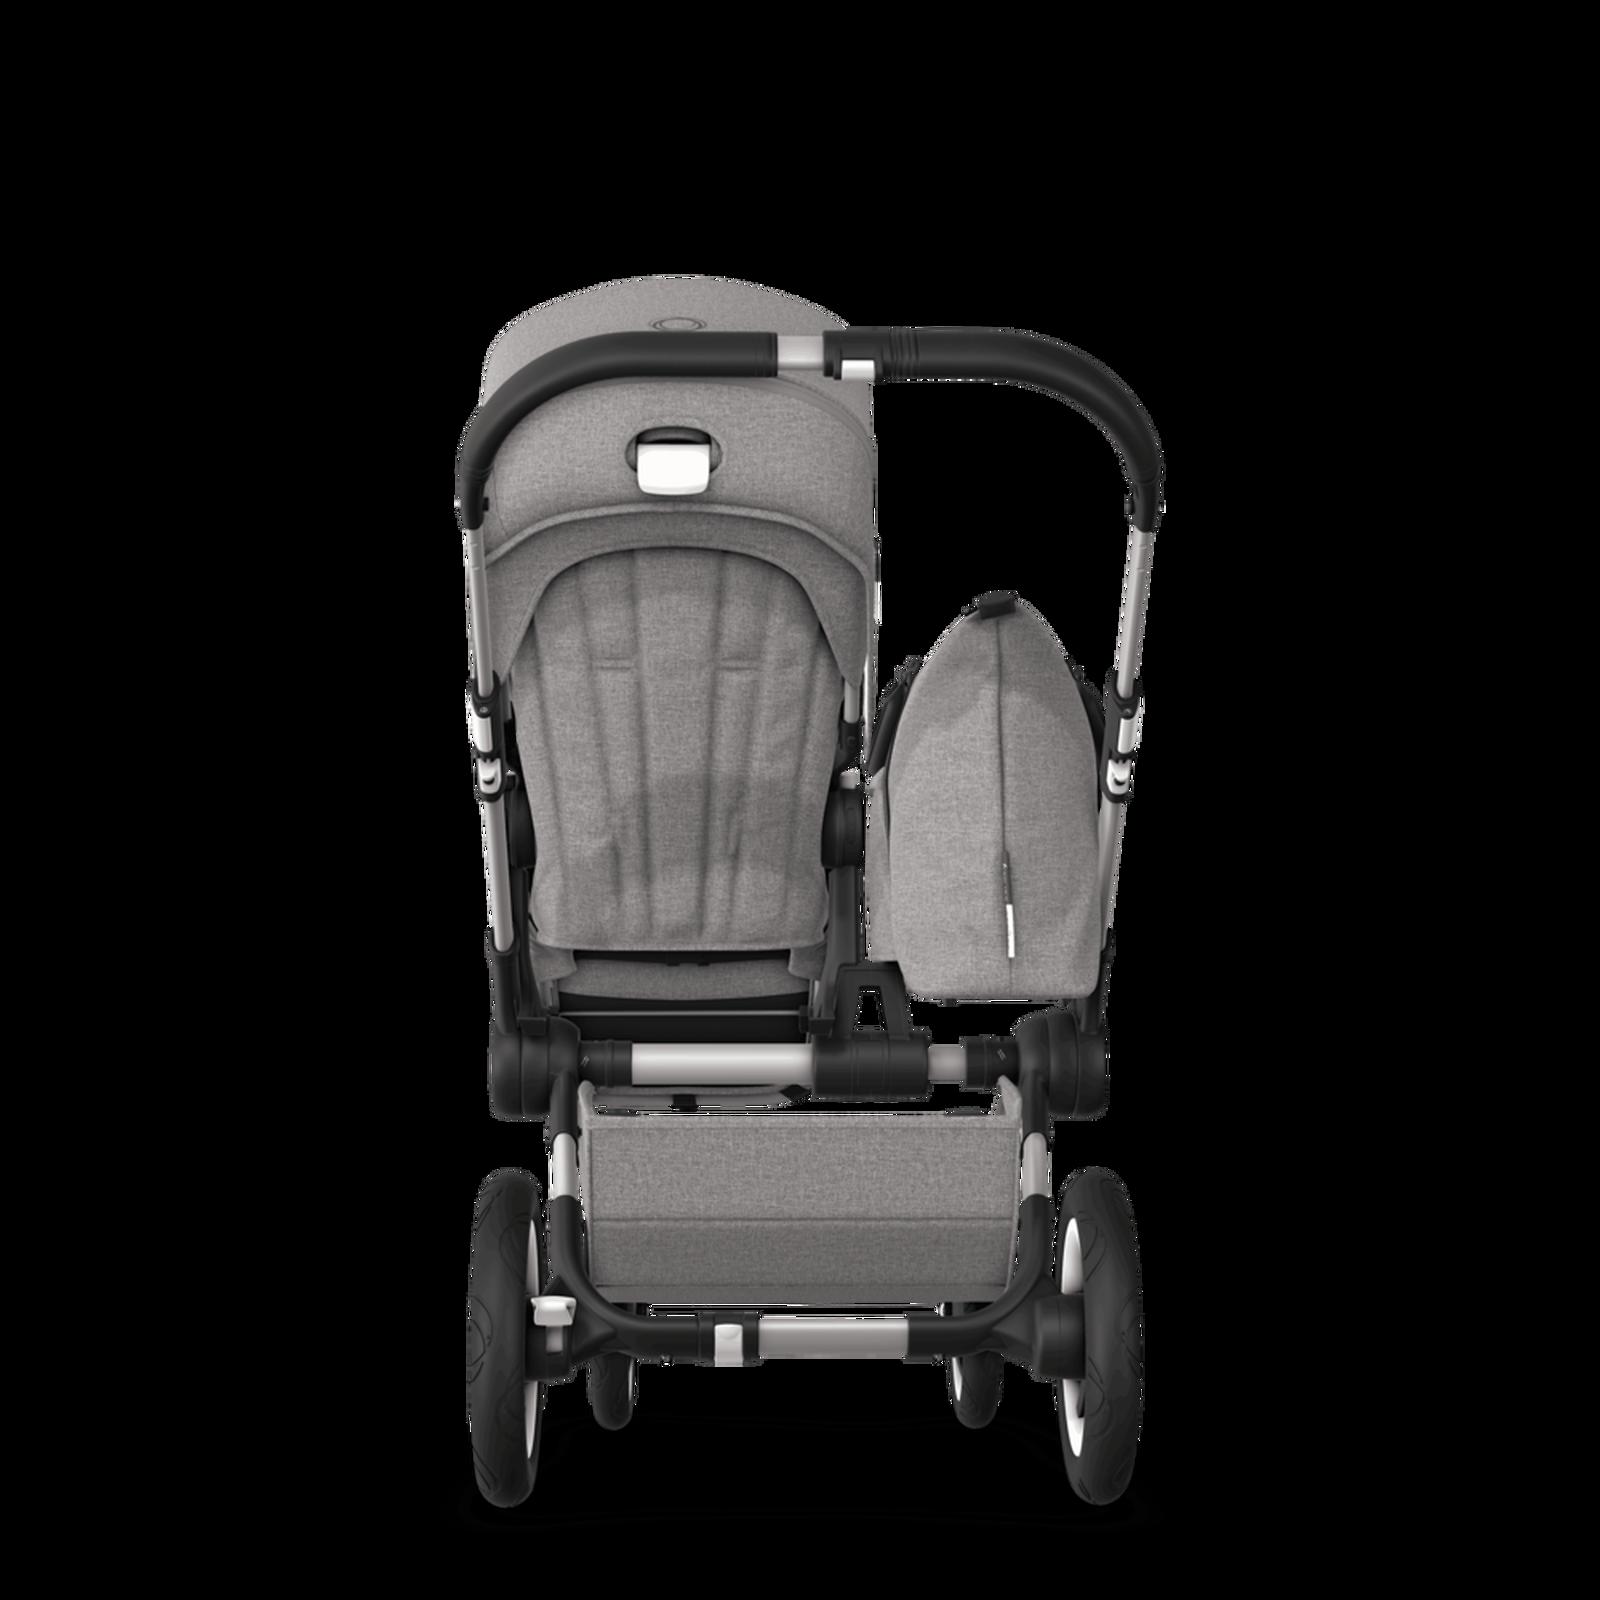 EU Bugaboo Donkey 2 Mono Seat and bassinet Mineral Light Grey melange, Black Chassis